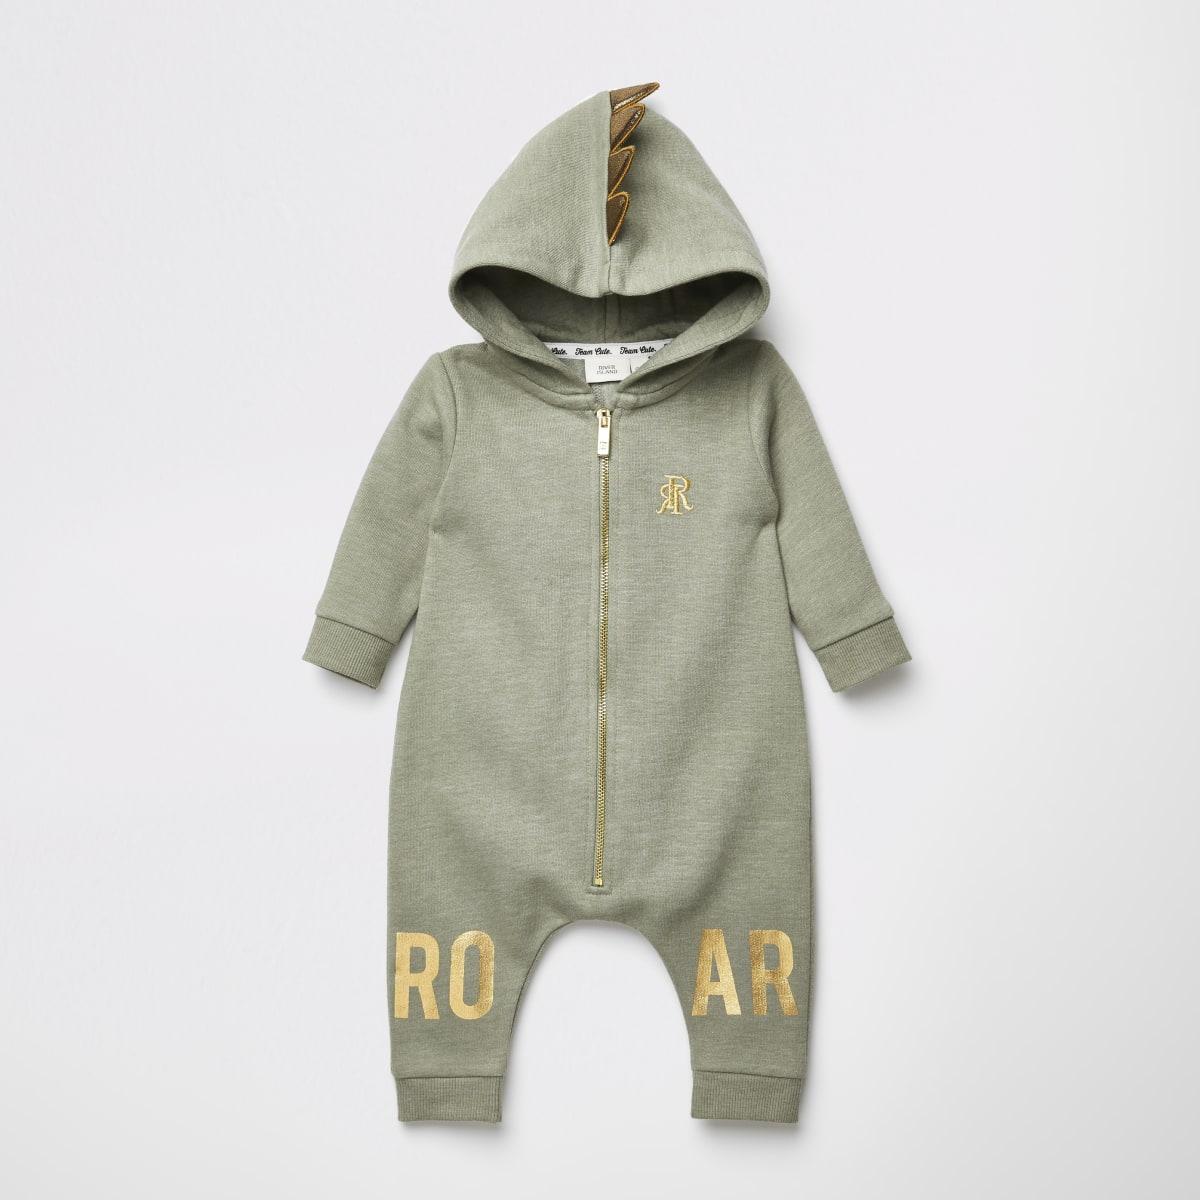 Baby khaki 'Roar' hooded baby grow